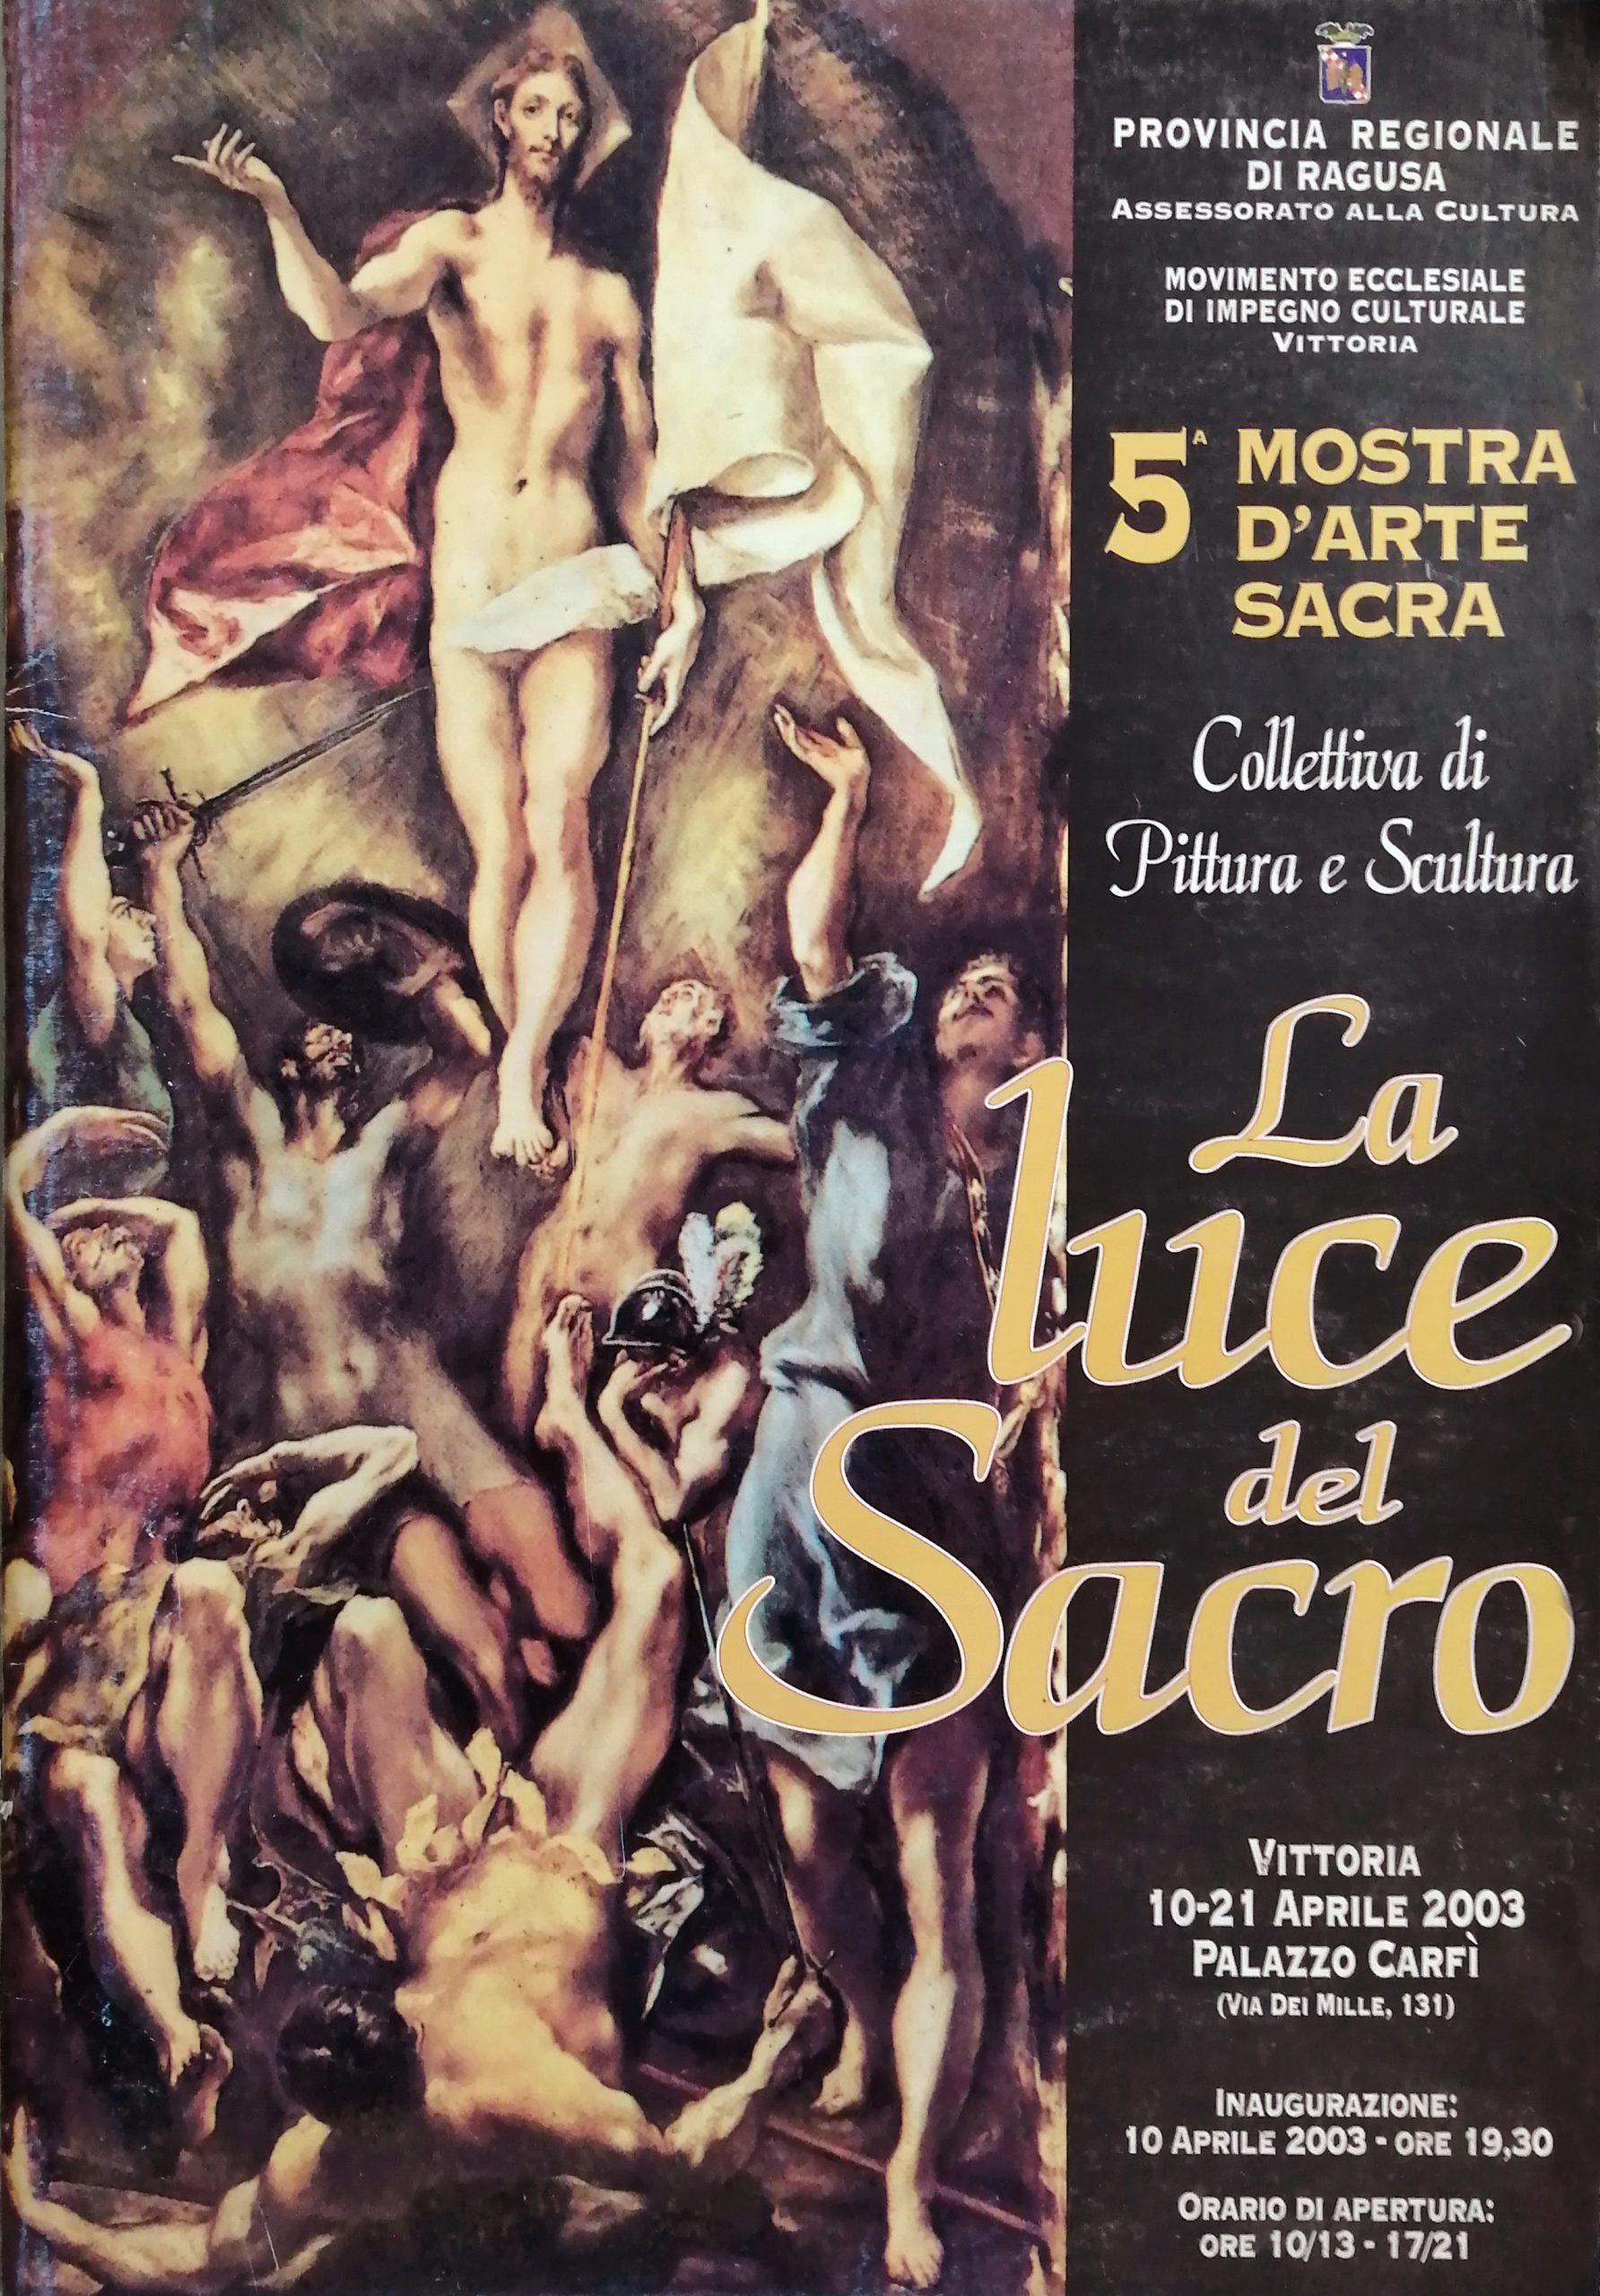 2003 La luce del sacro Palazzo Carfi Vittoria scaled - Bibliography/ Catalogues